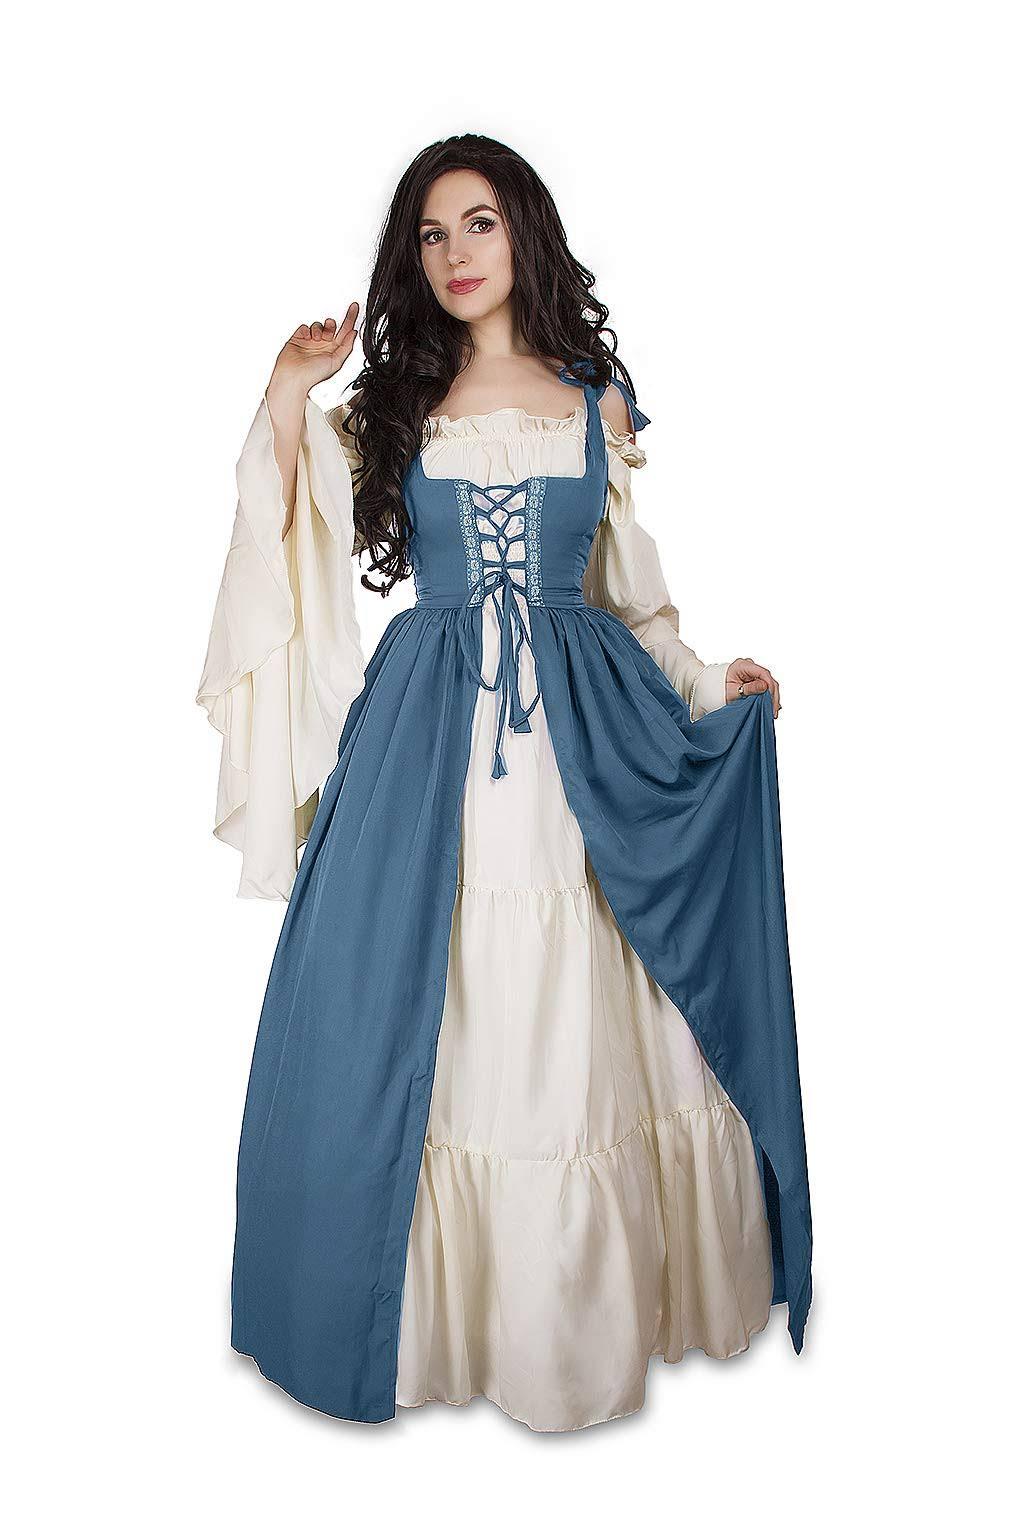 amp; Reminisce Irish Mythic Medieval Blue Costume Cream Over French Dress Set Renaissance Chemise 0q0FwxHr